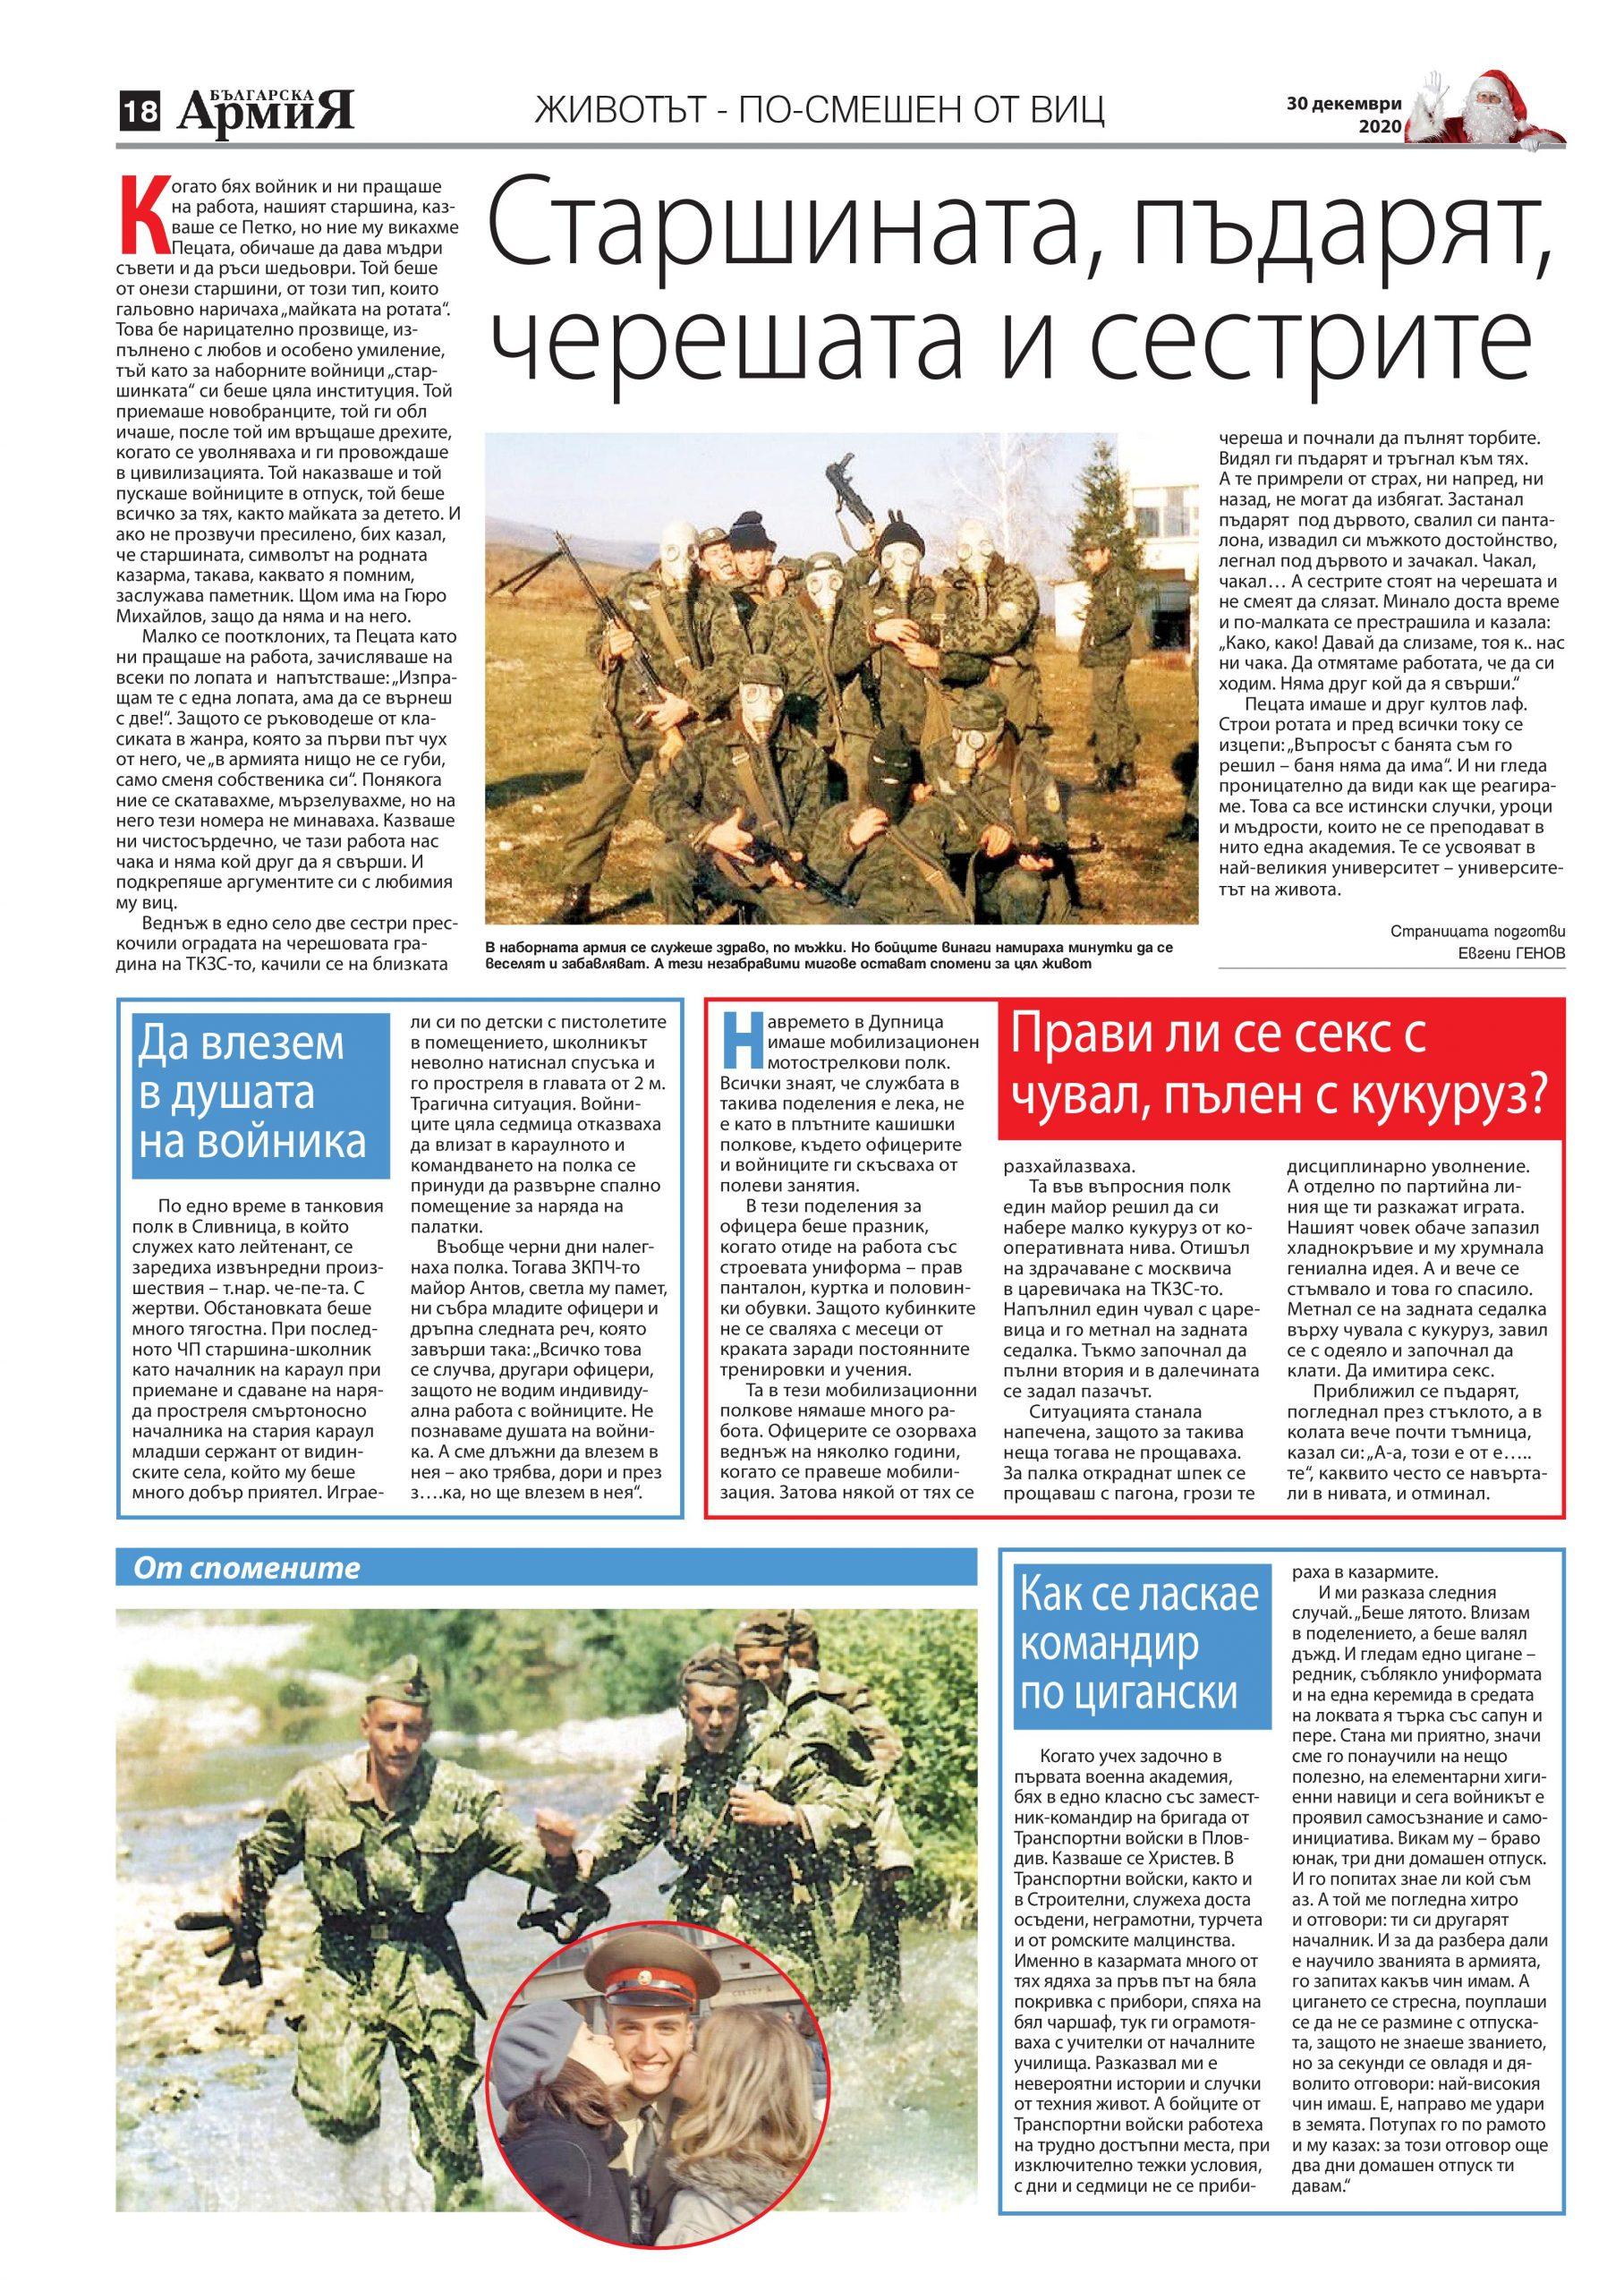 https://armymedia.bg/wp-content/uploads/2015/06/18-54-scaled.jpg